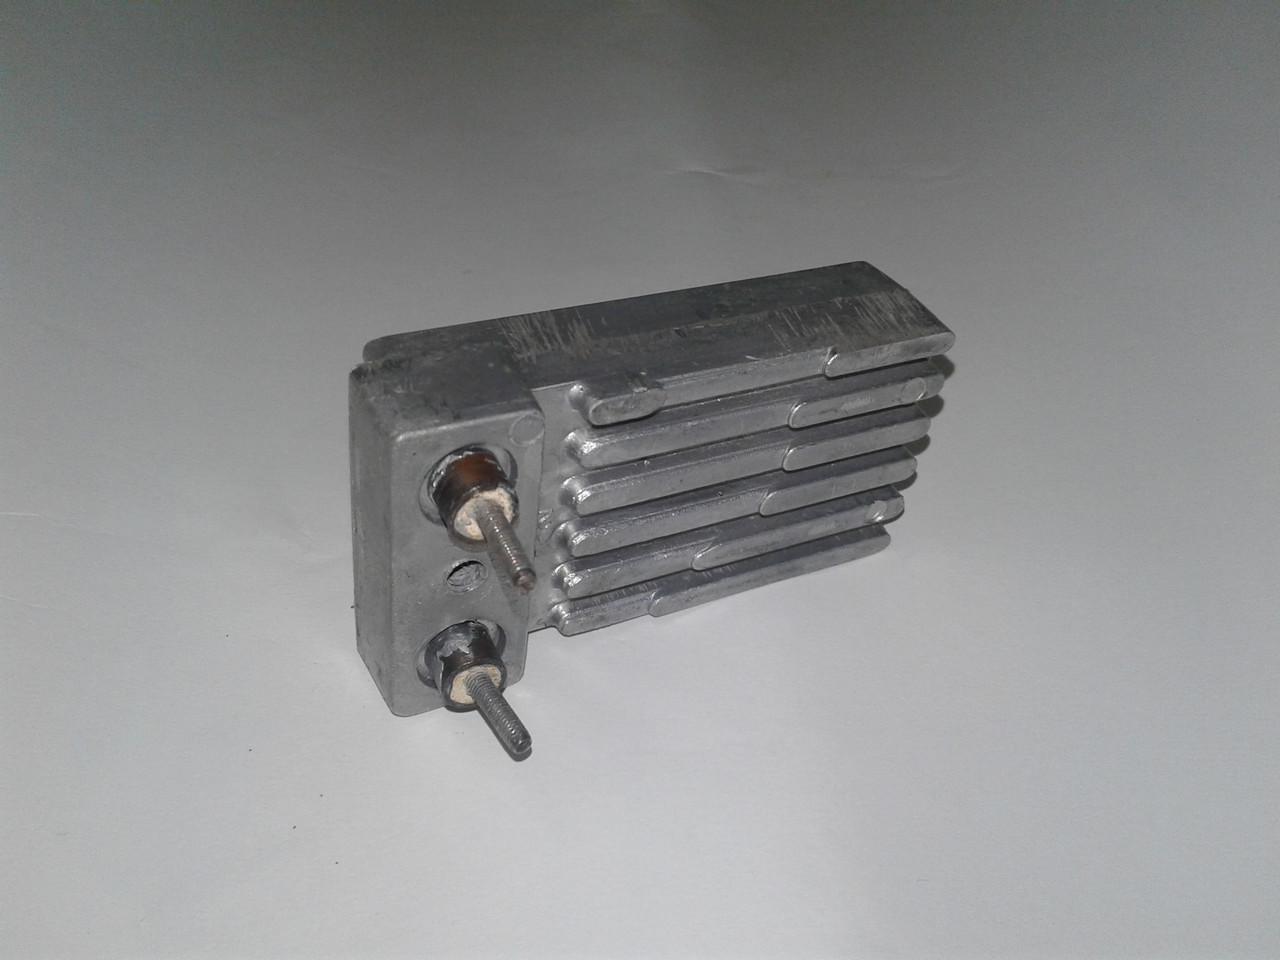 Тэн 2,0 кВт для подогревателя Атлант